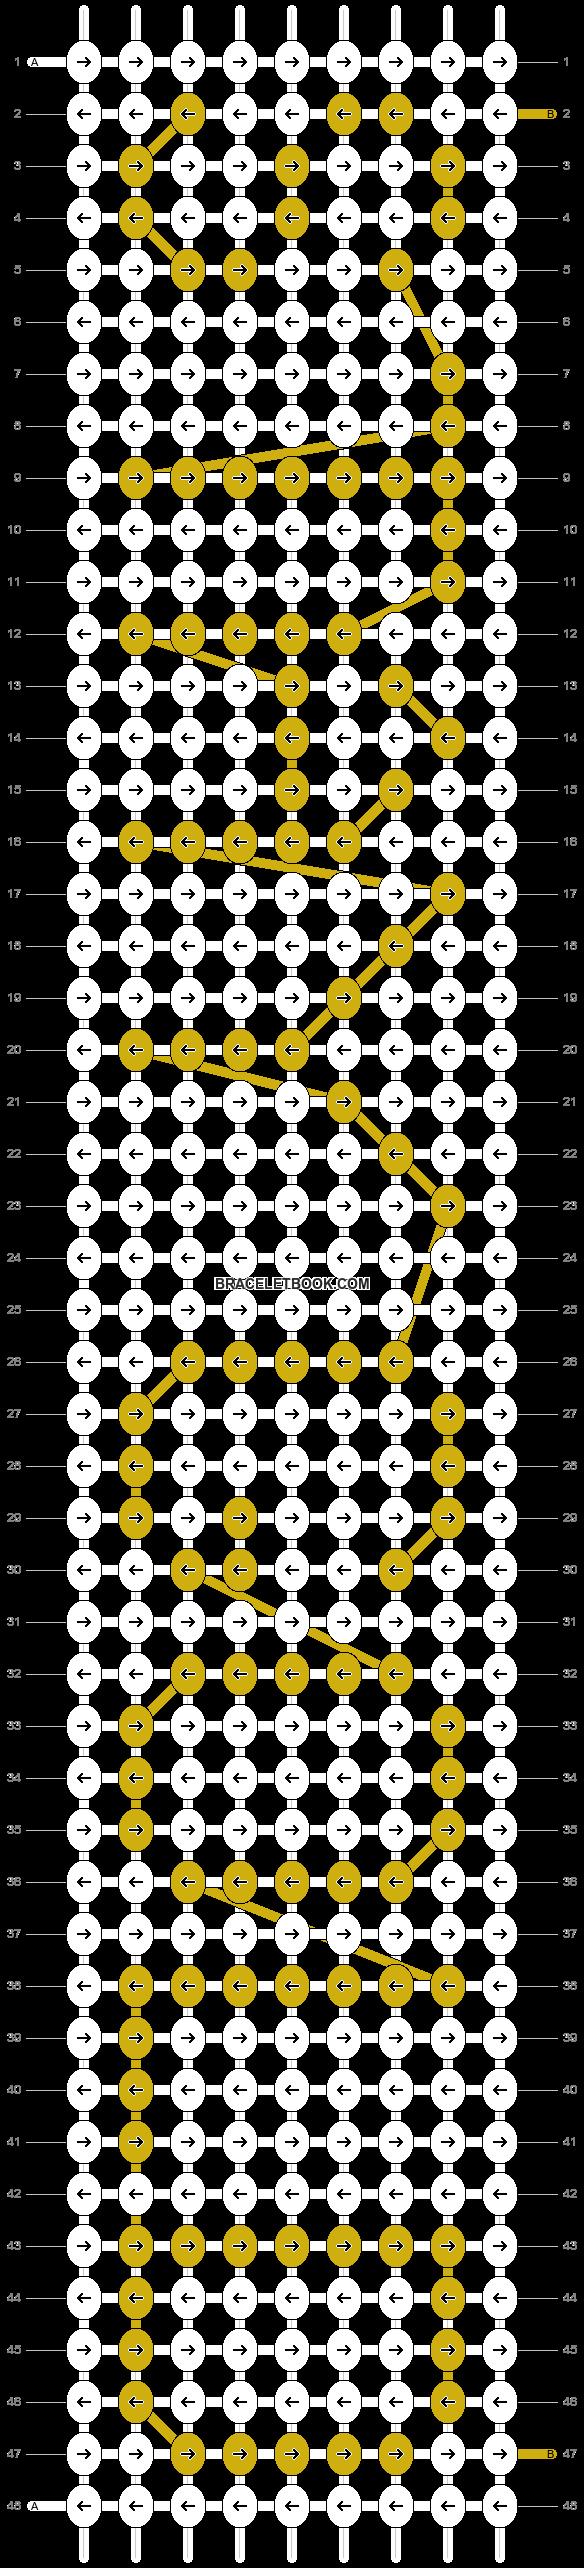 Alpha pattern #3893 pattern